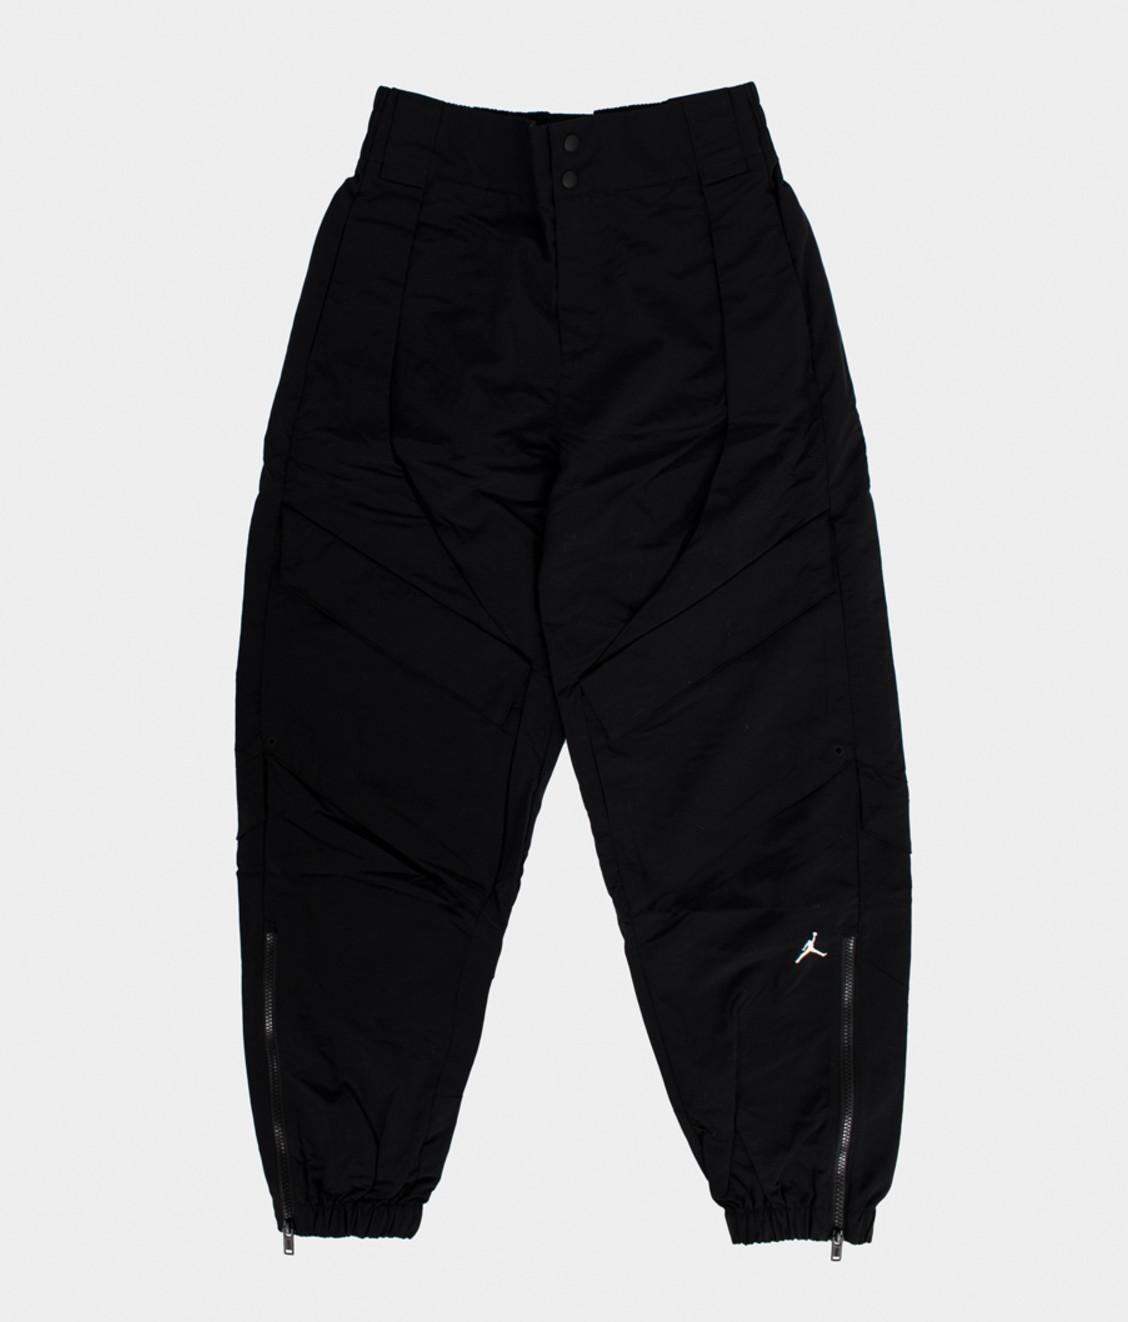 Nike Jordan Utility Pant Black